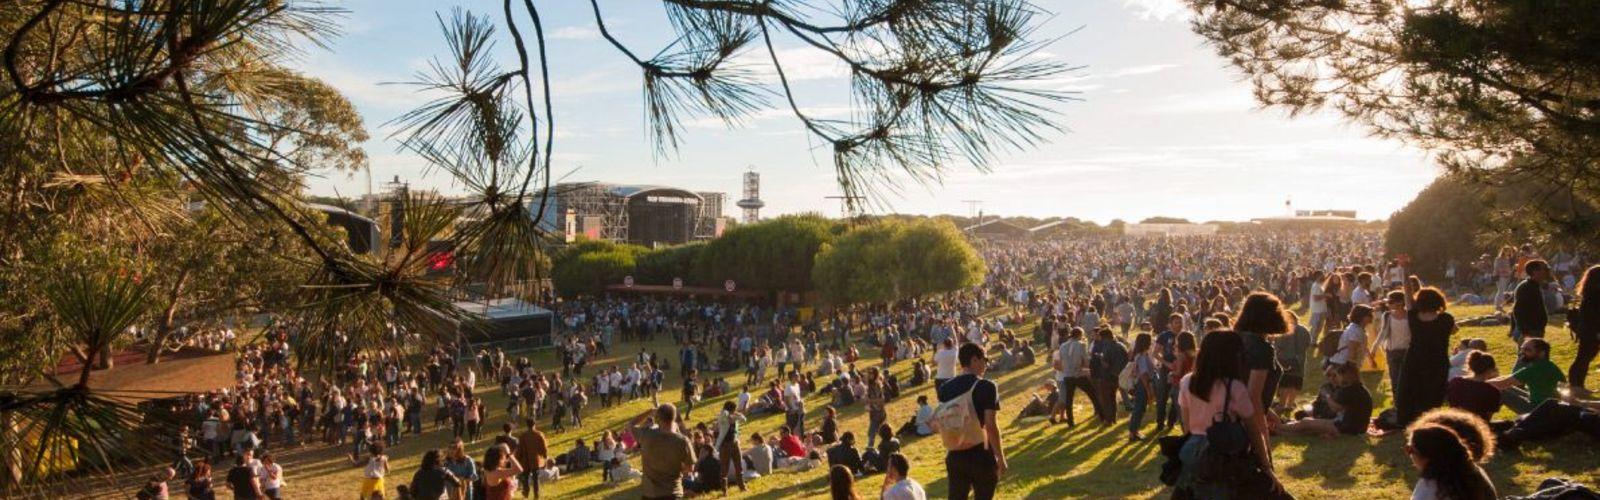 Top 10 Music Festivals in Portugal 2020